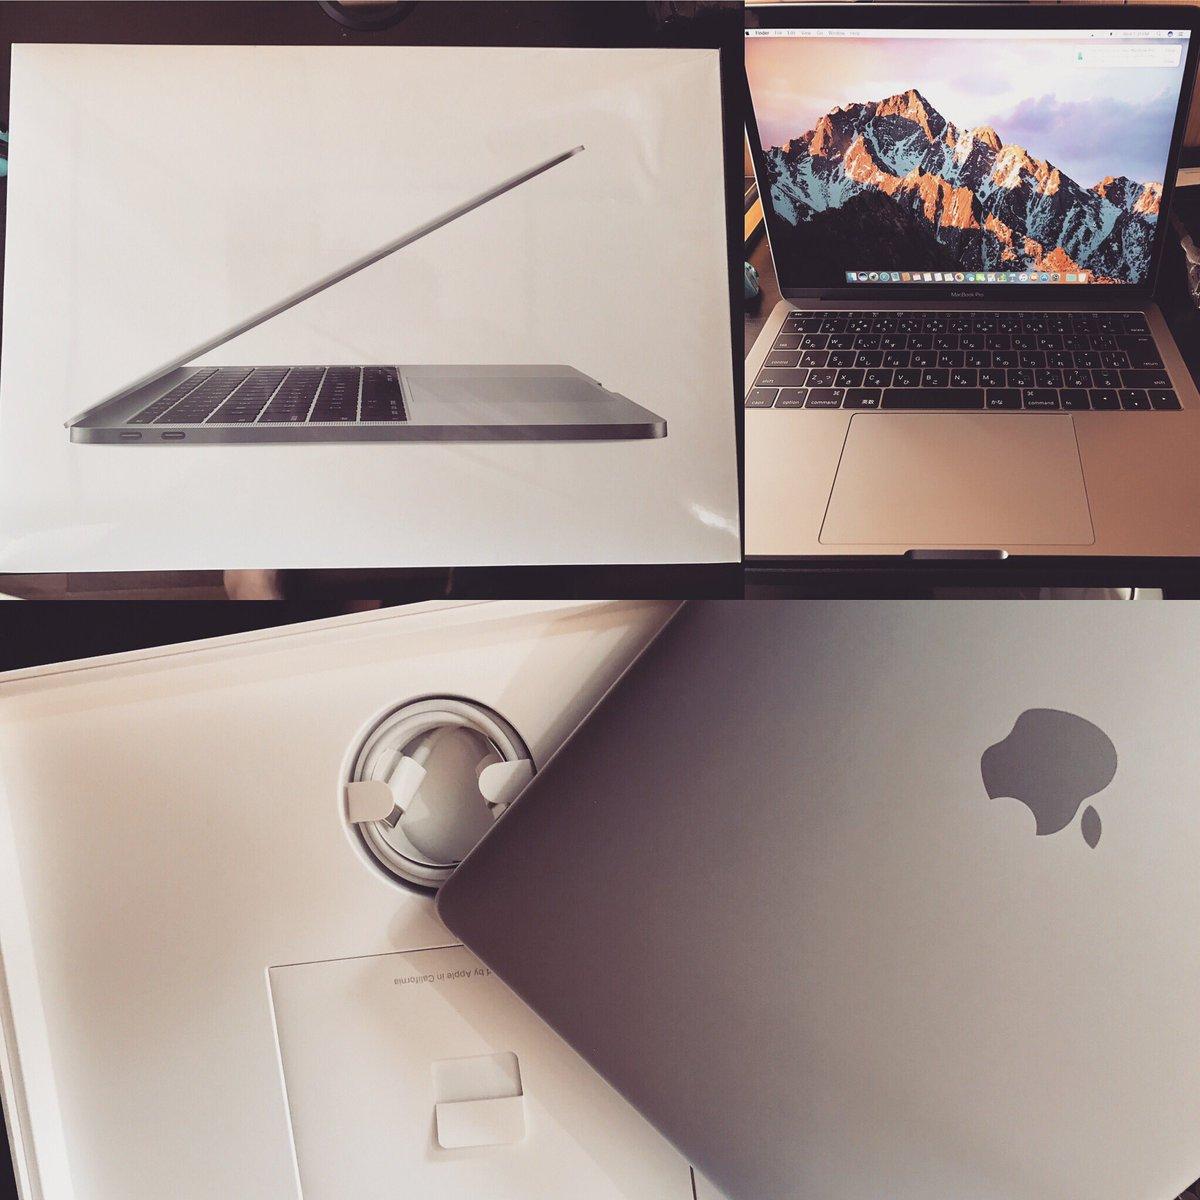 #MacBookPro #2k16 #256gb #grey  New babe<br>http://pic.twitter.com/lCvdcLa69s